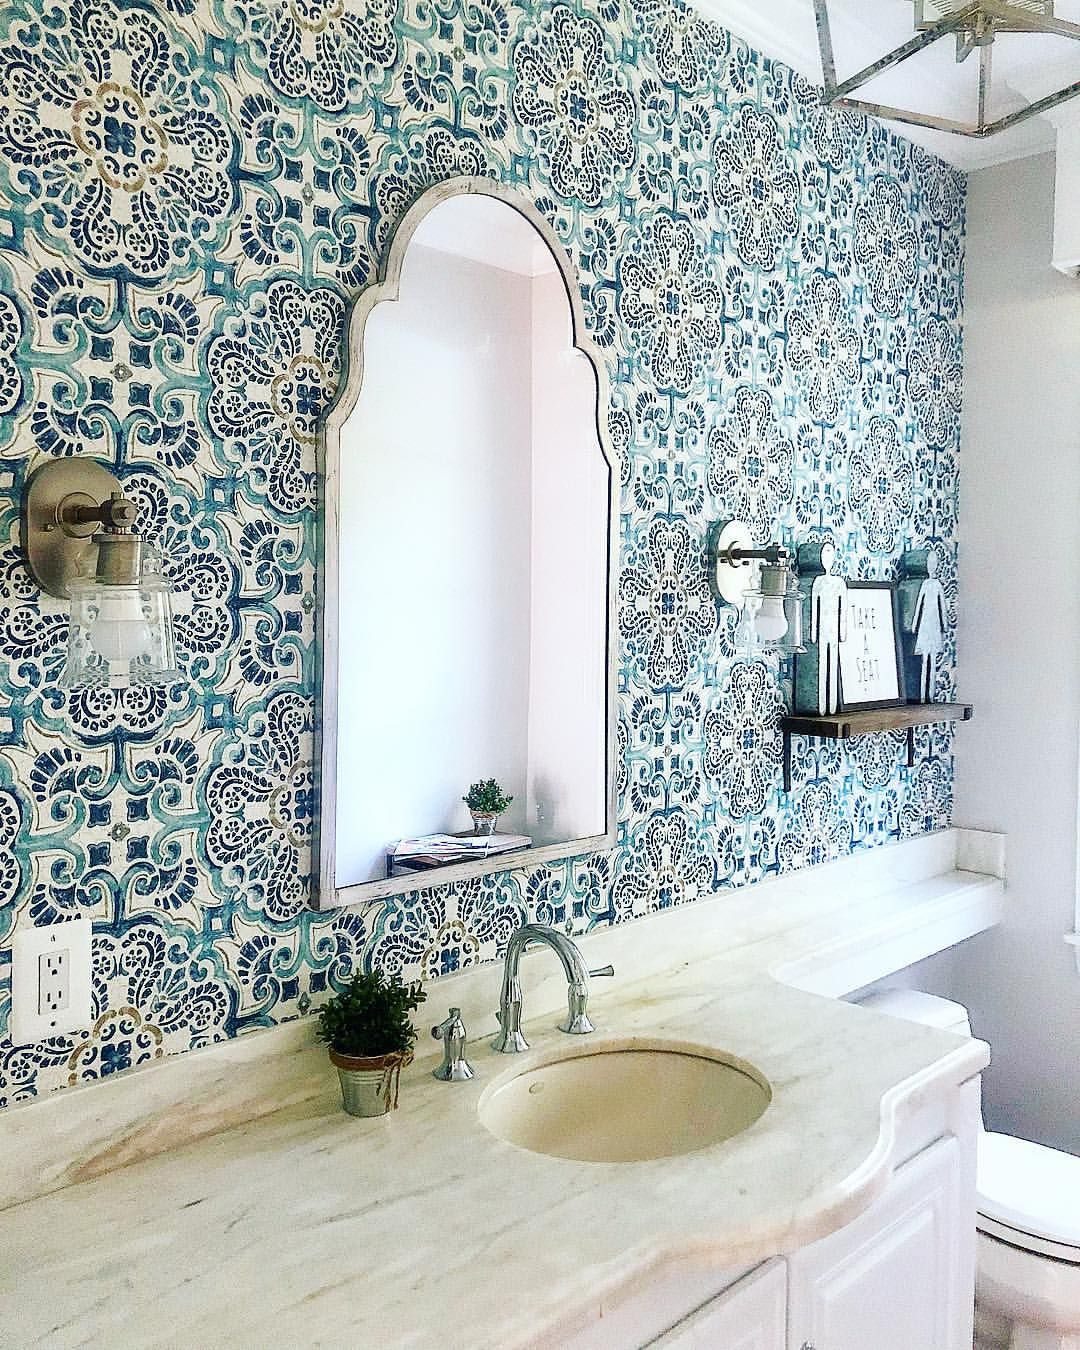 I love the tile backsplash I. This powder bath. bathroom